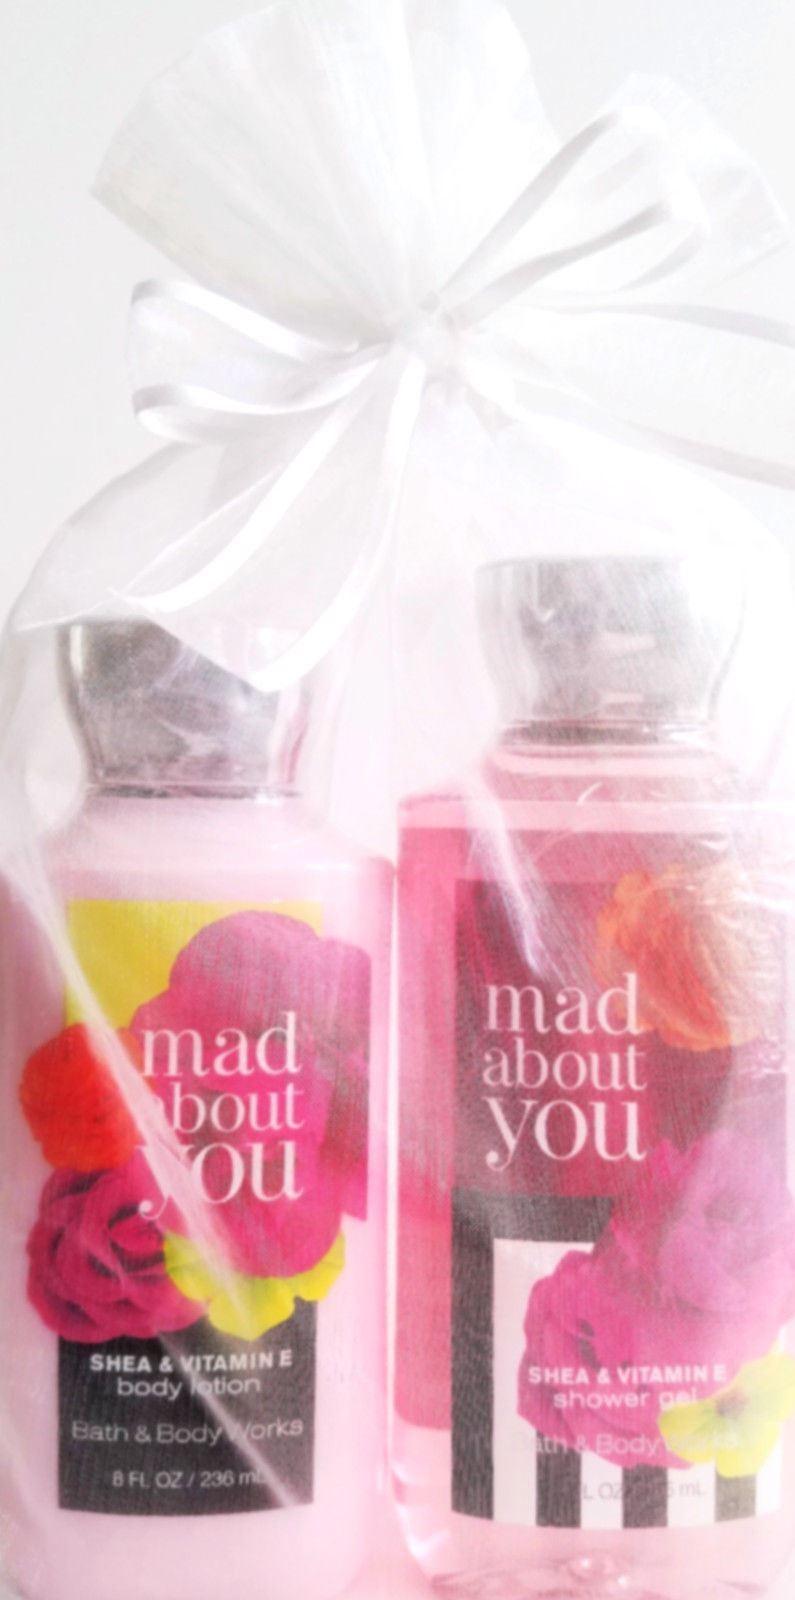 Bath Body Works Mad About You Body Lotion Bath Gel Gift Set Of